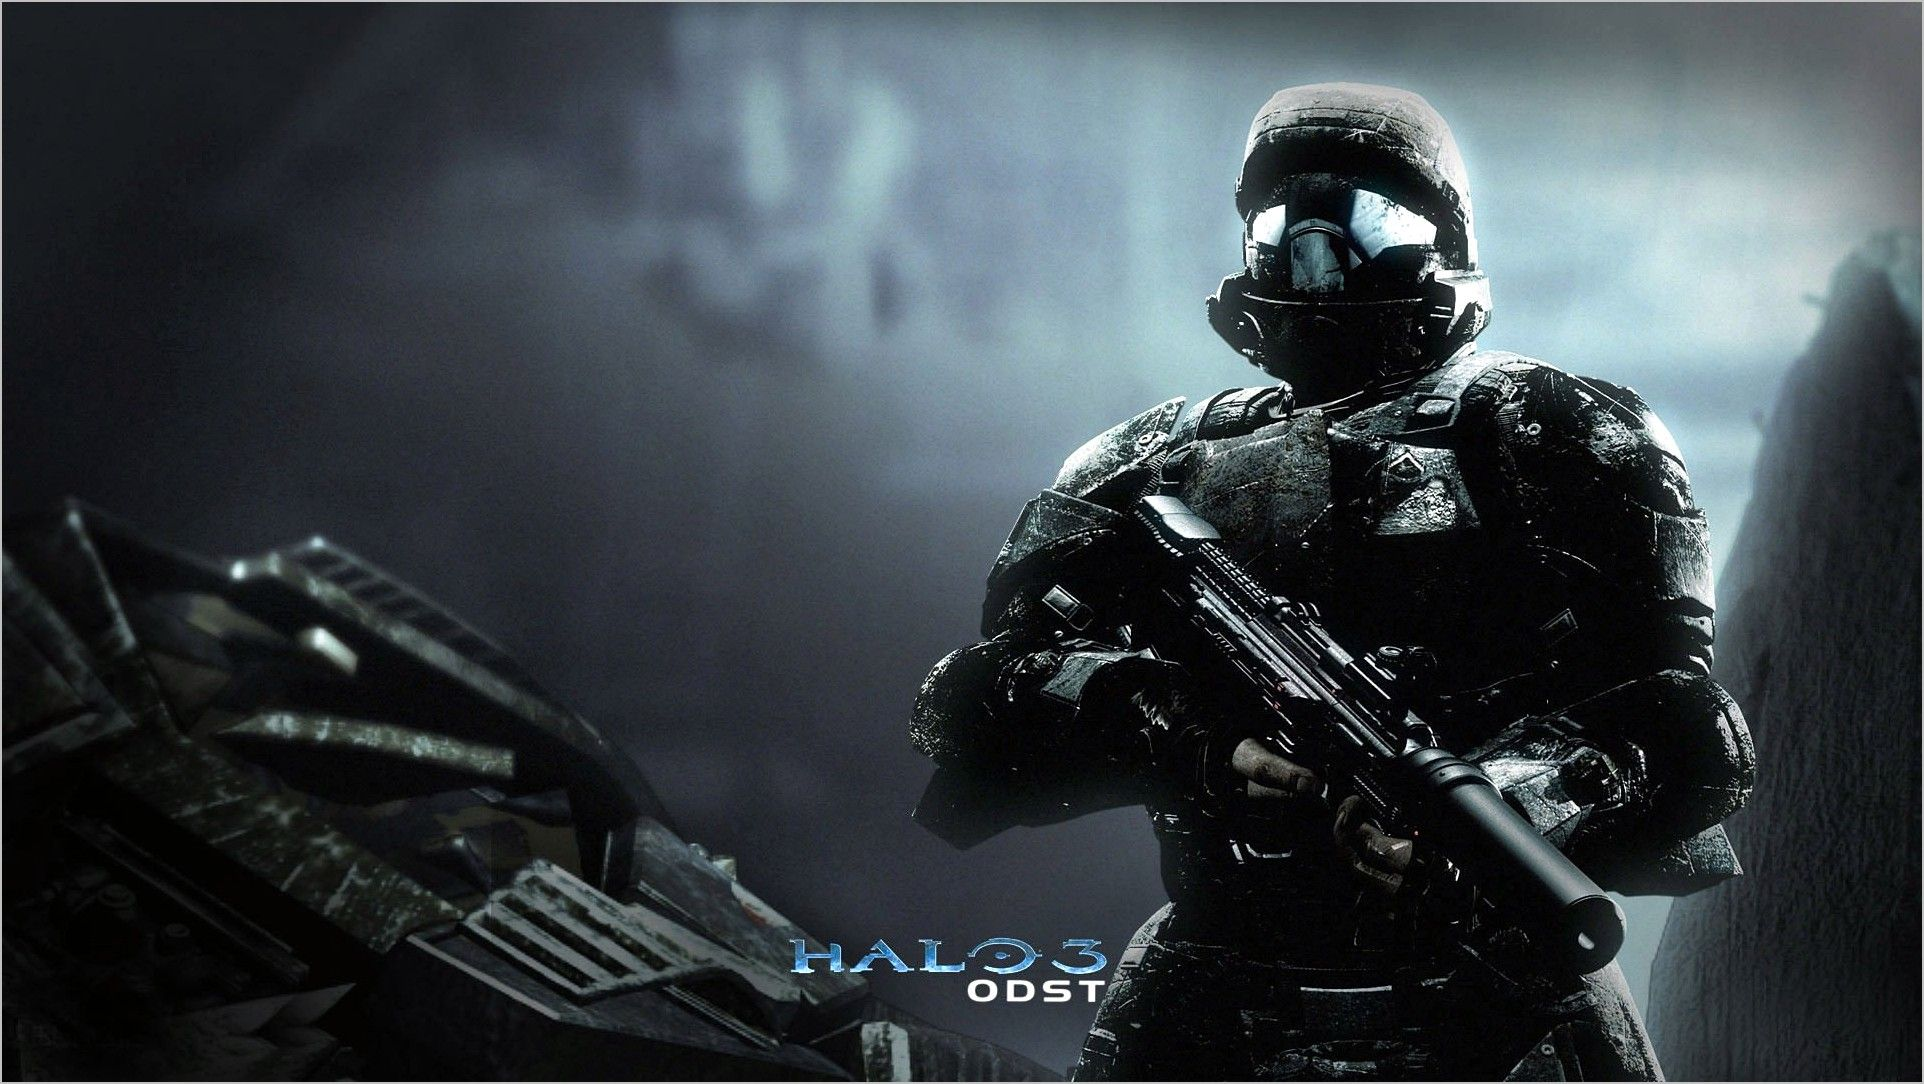 Halo 3 Odst 4k Wallpaper In 2020 Halo 3 Odst Halo 3 Halo Game